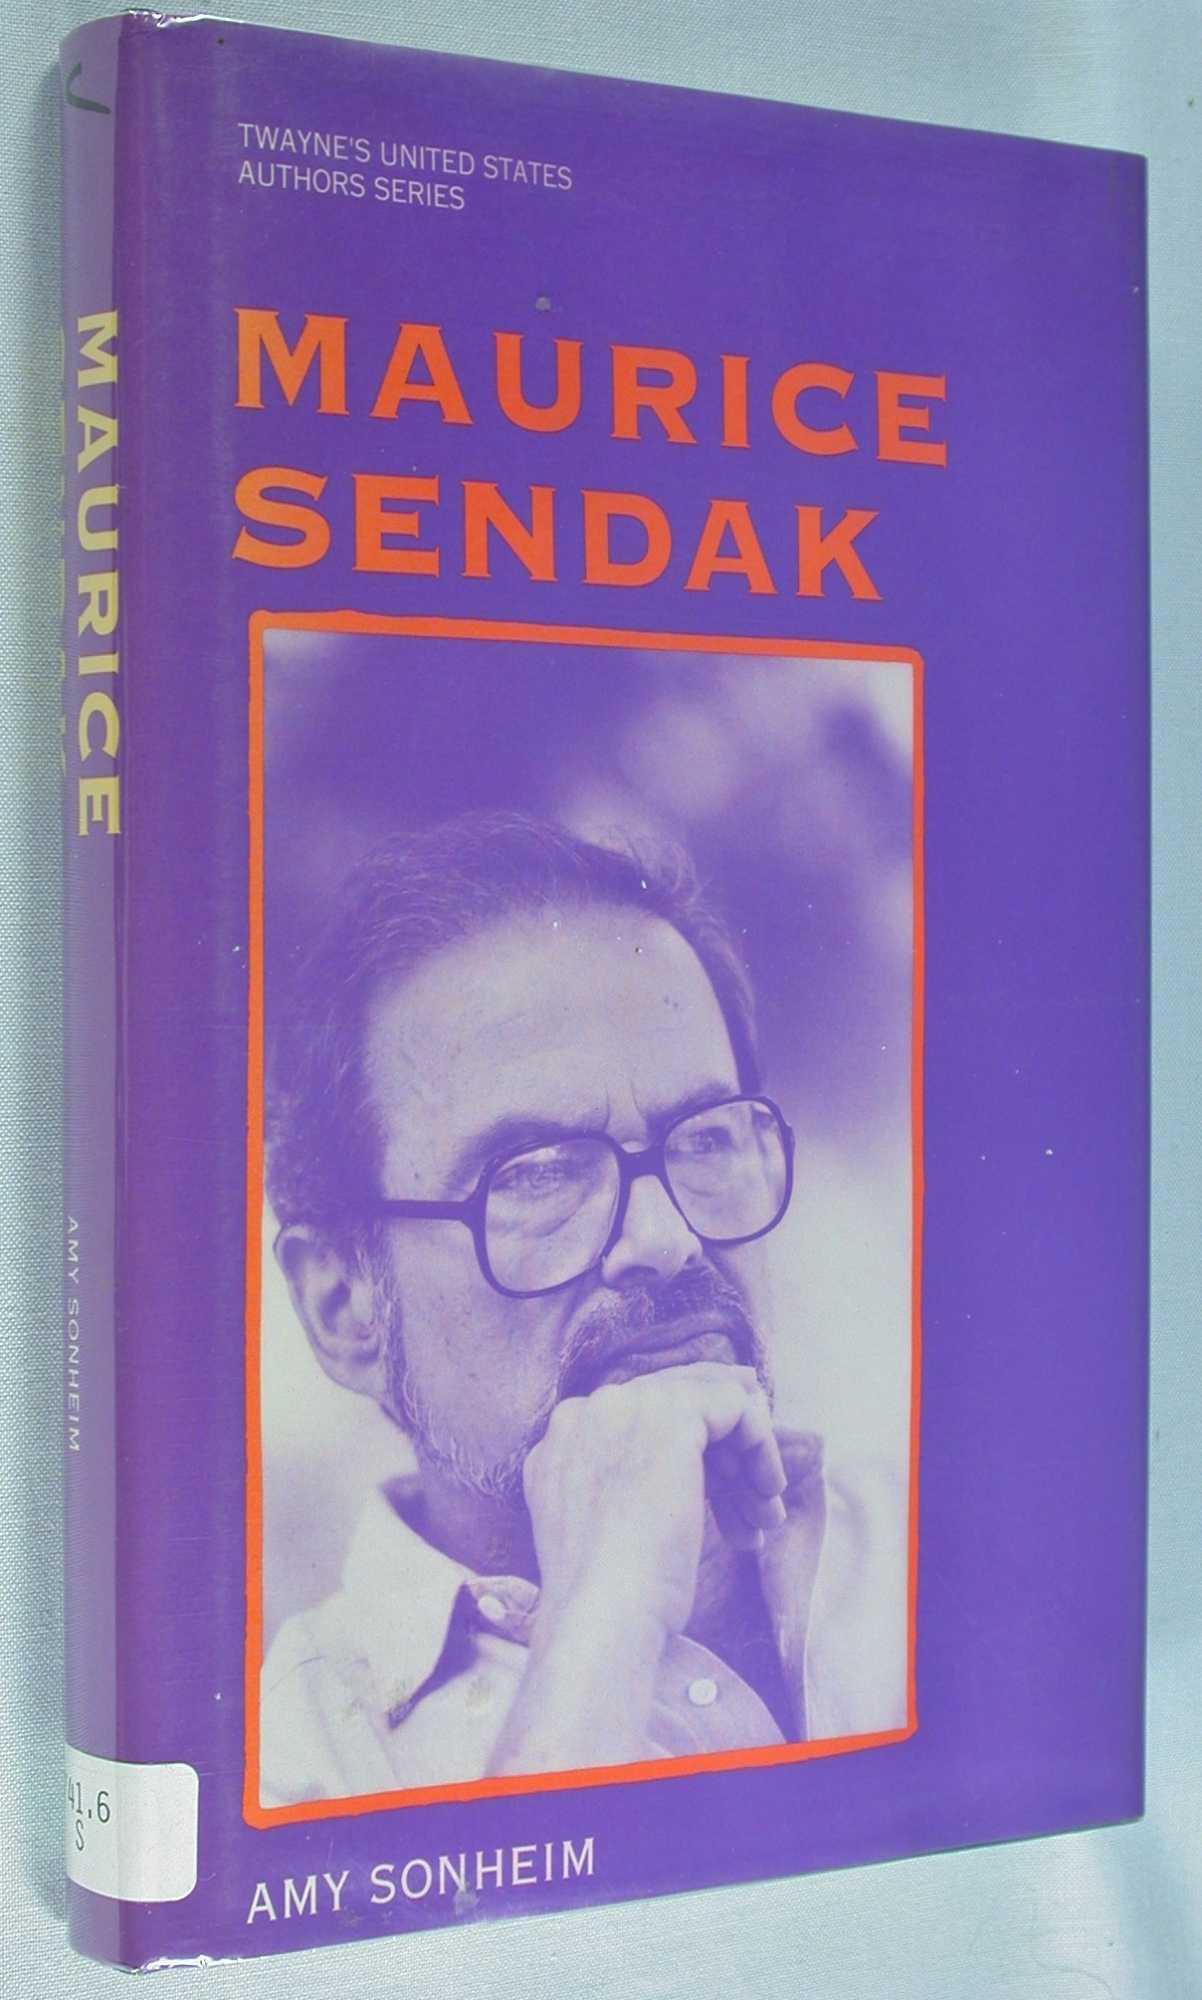 Maurice Sendak (Twayne's United States Authors Series), Sonheim, Amy